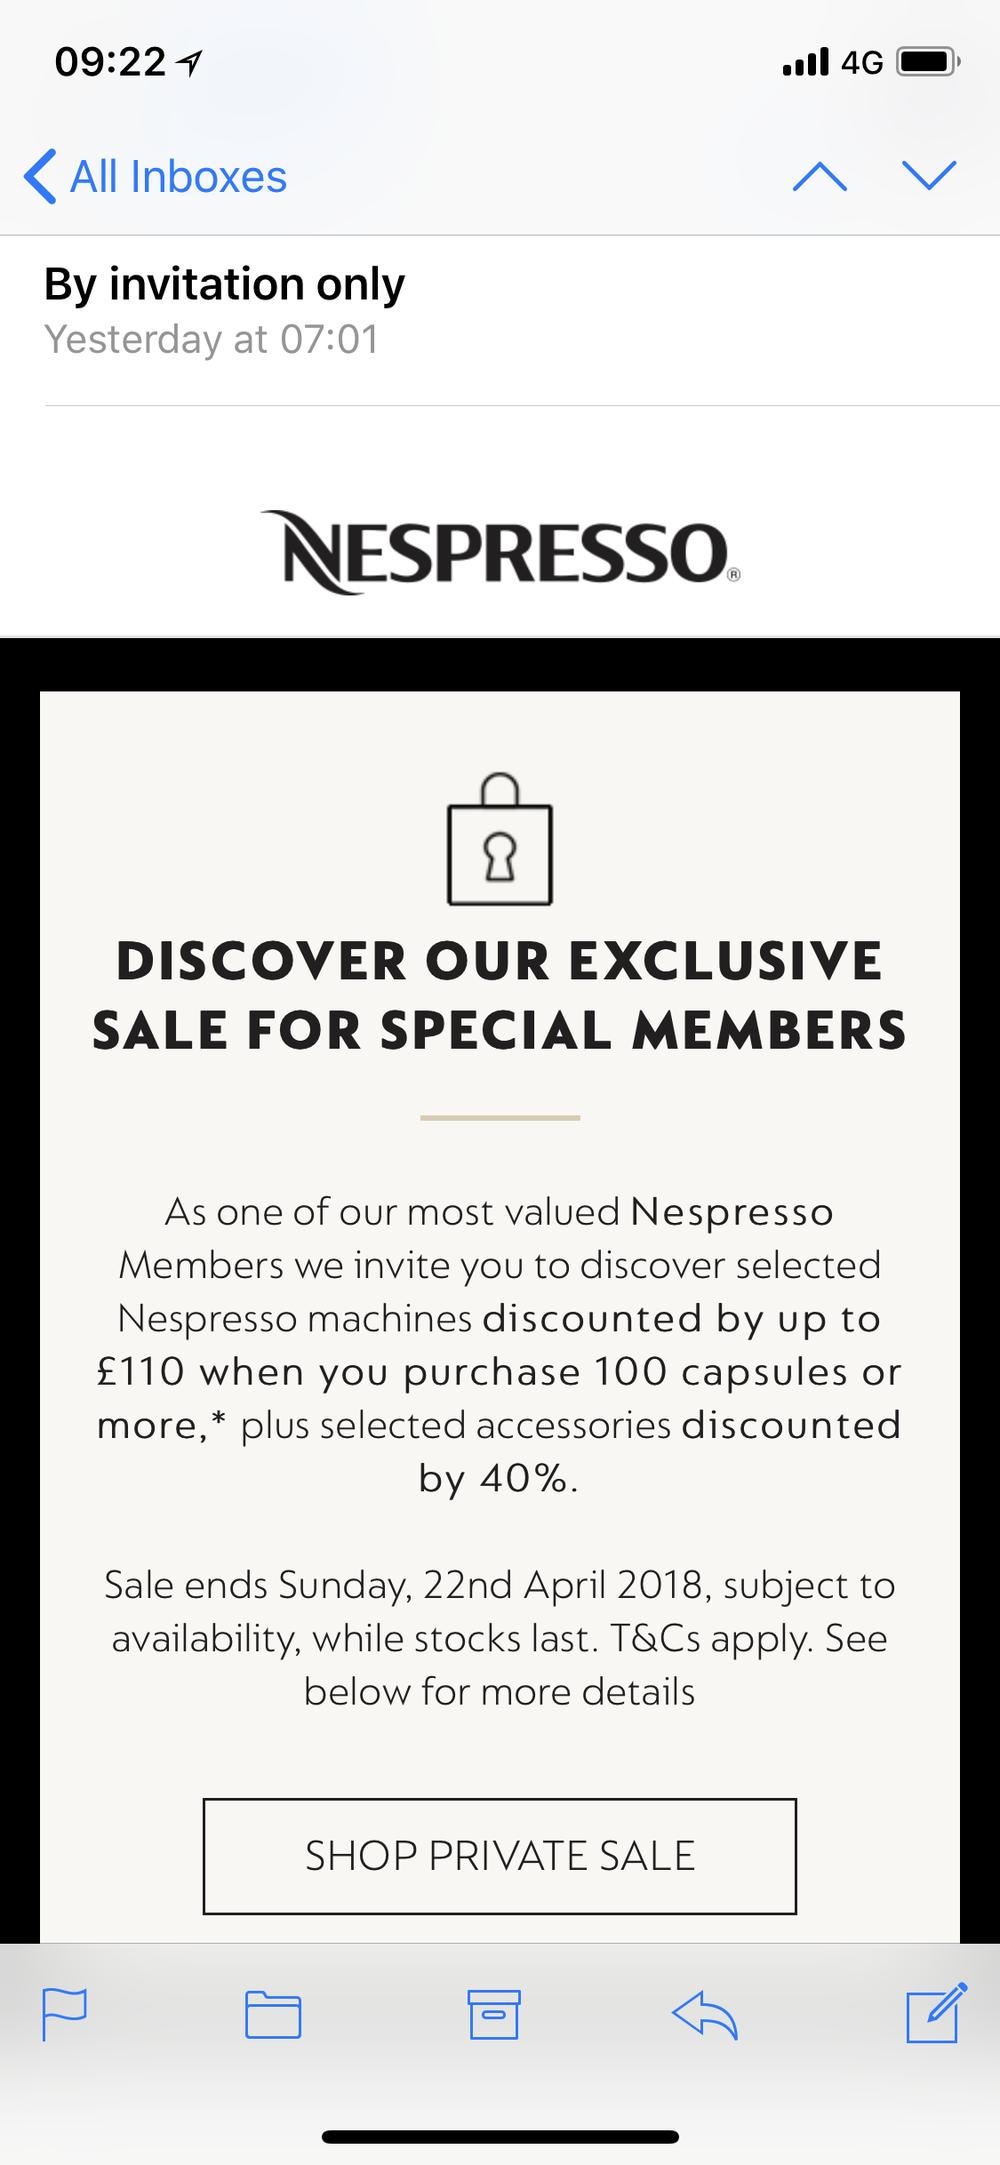 Nespresso's newsletter example